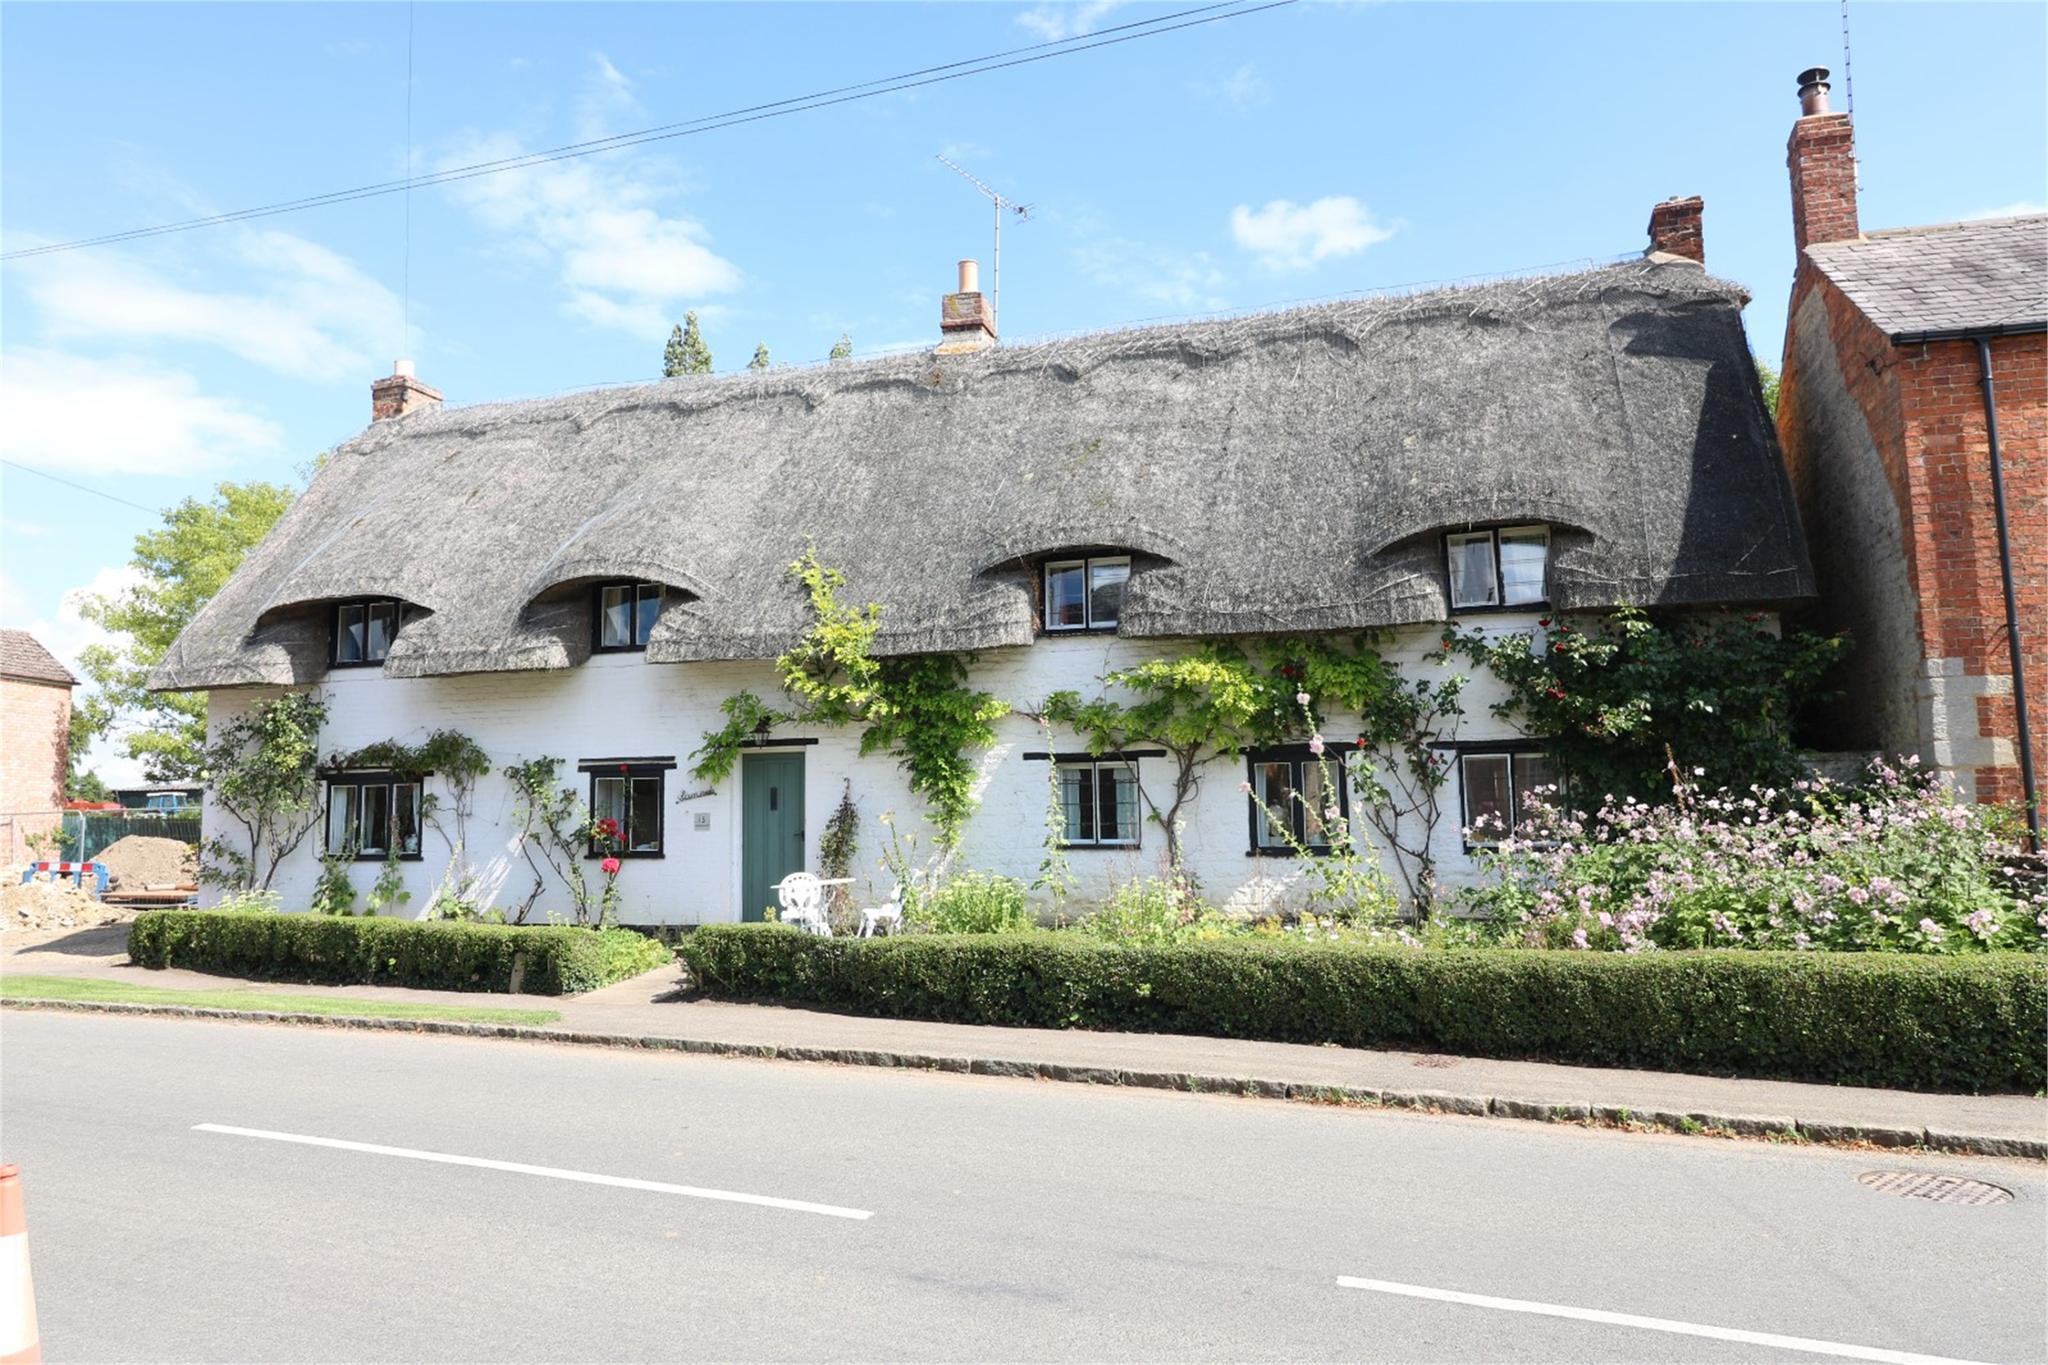 Woodgate, Helpston, Peterborough, Cambridgeshire